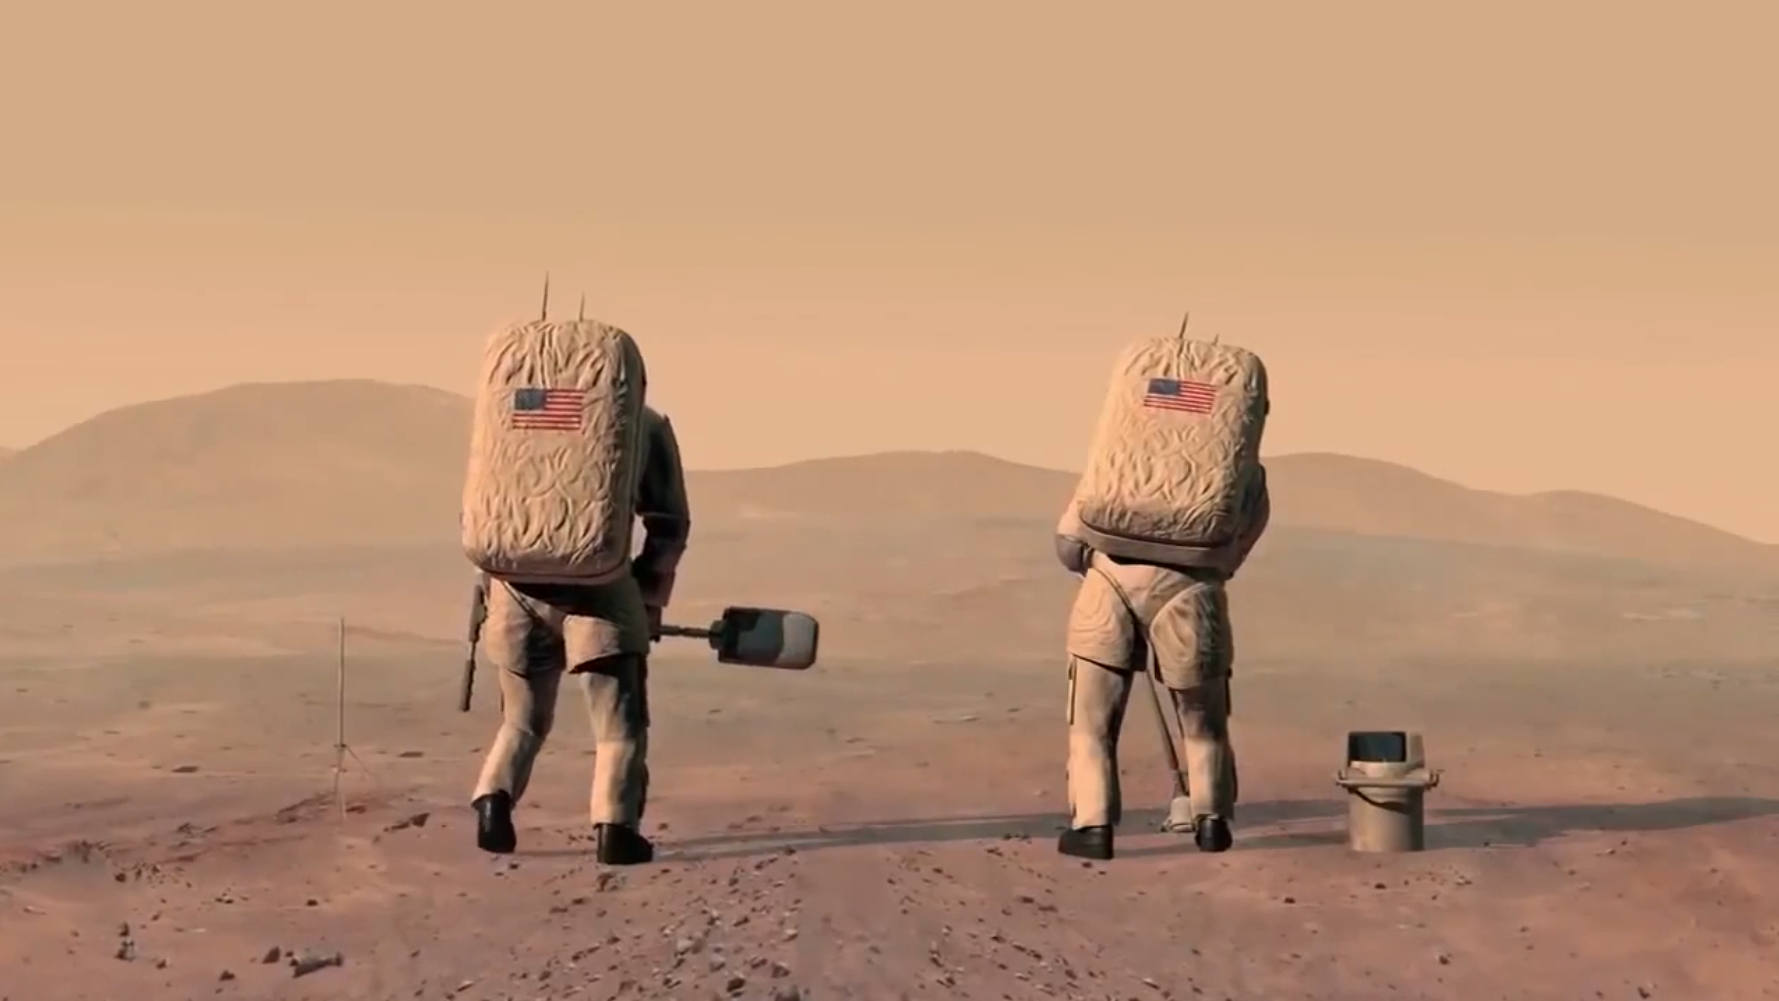 mars and human ile ilgili görsel sonucu